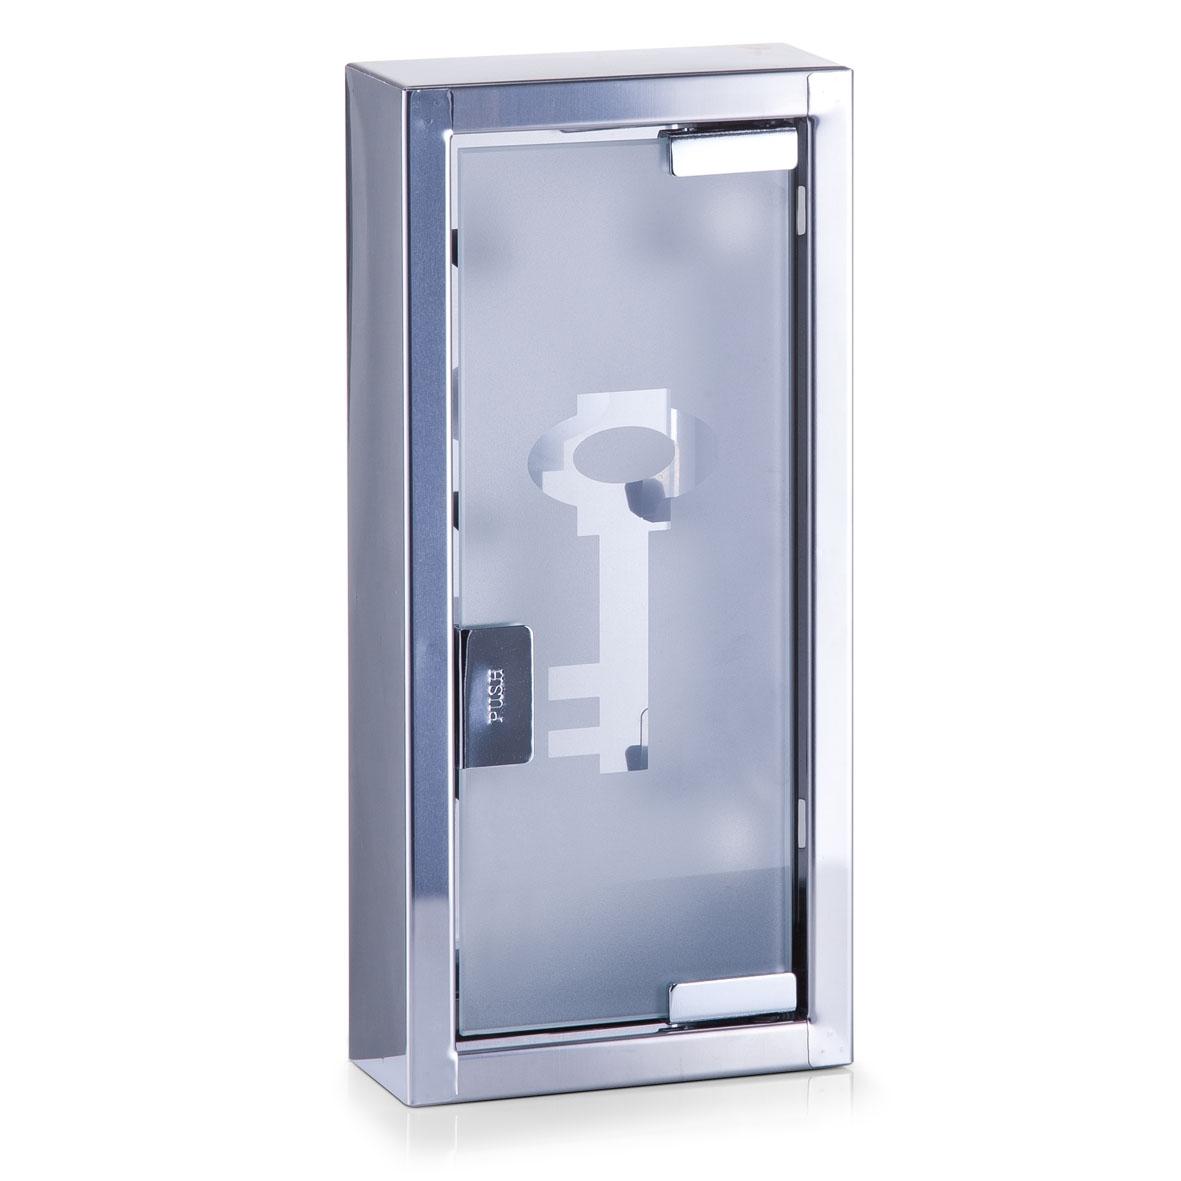 Suport pentru chei Office Otel inoxidabil l14xA6xH30 cm